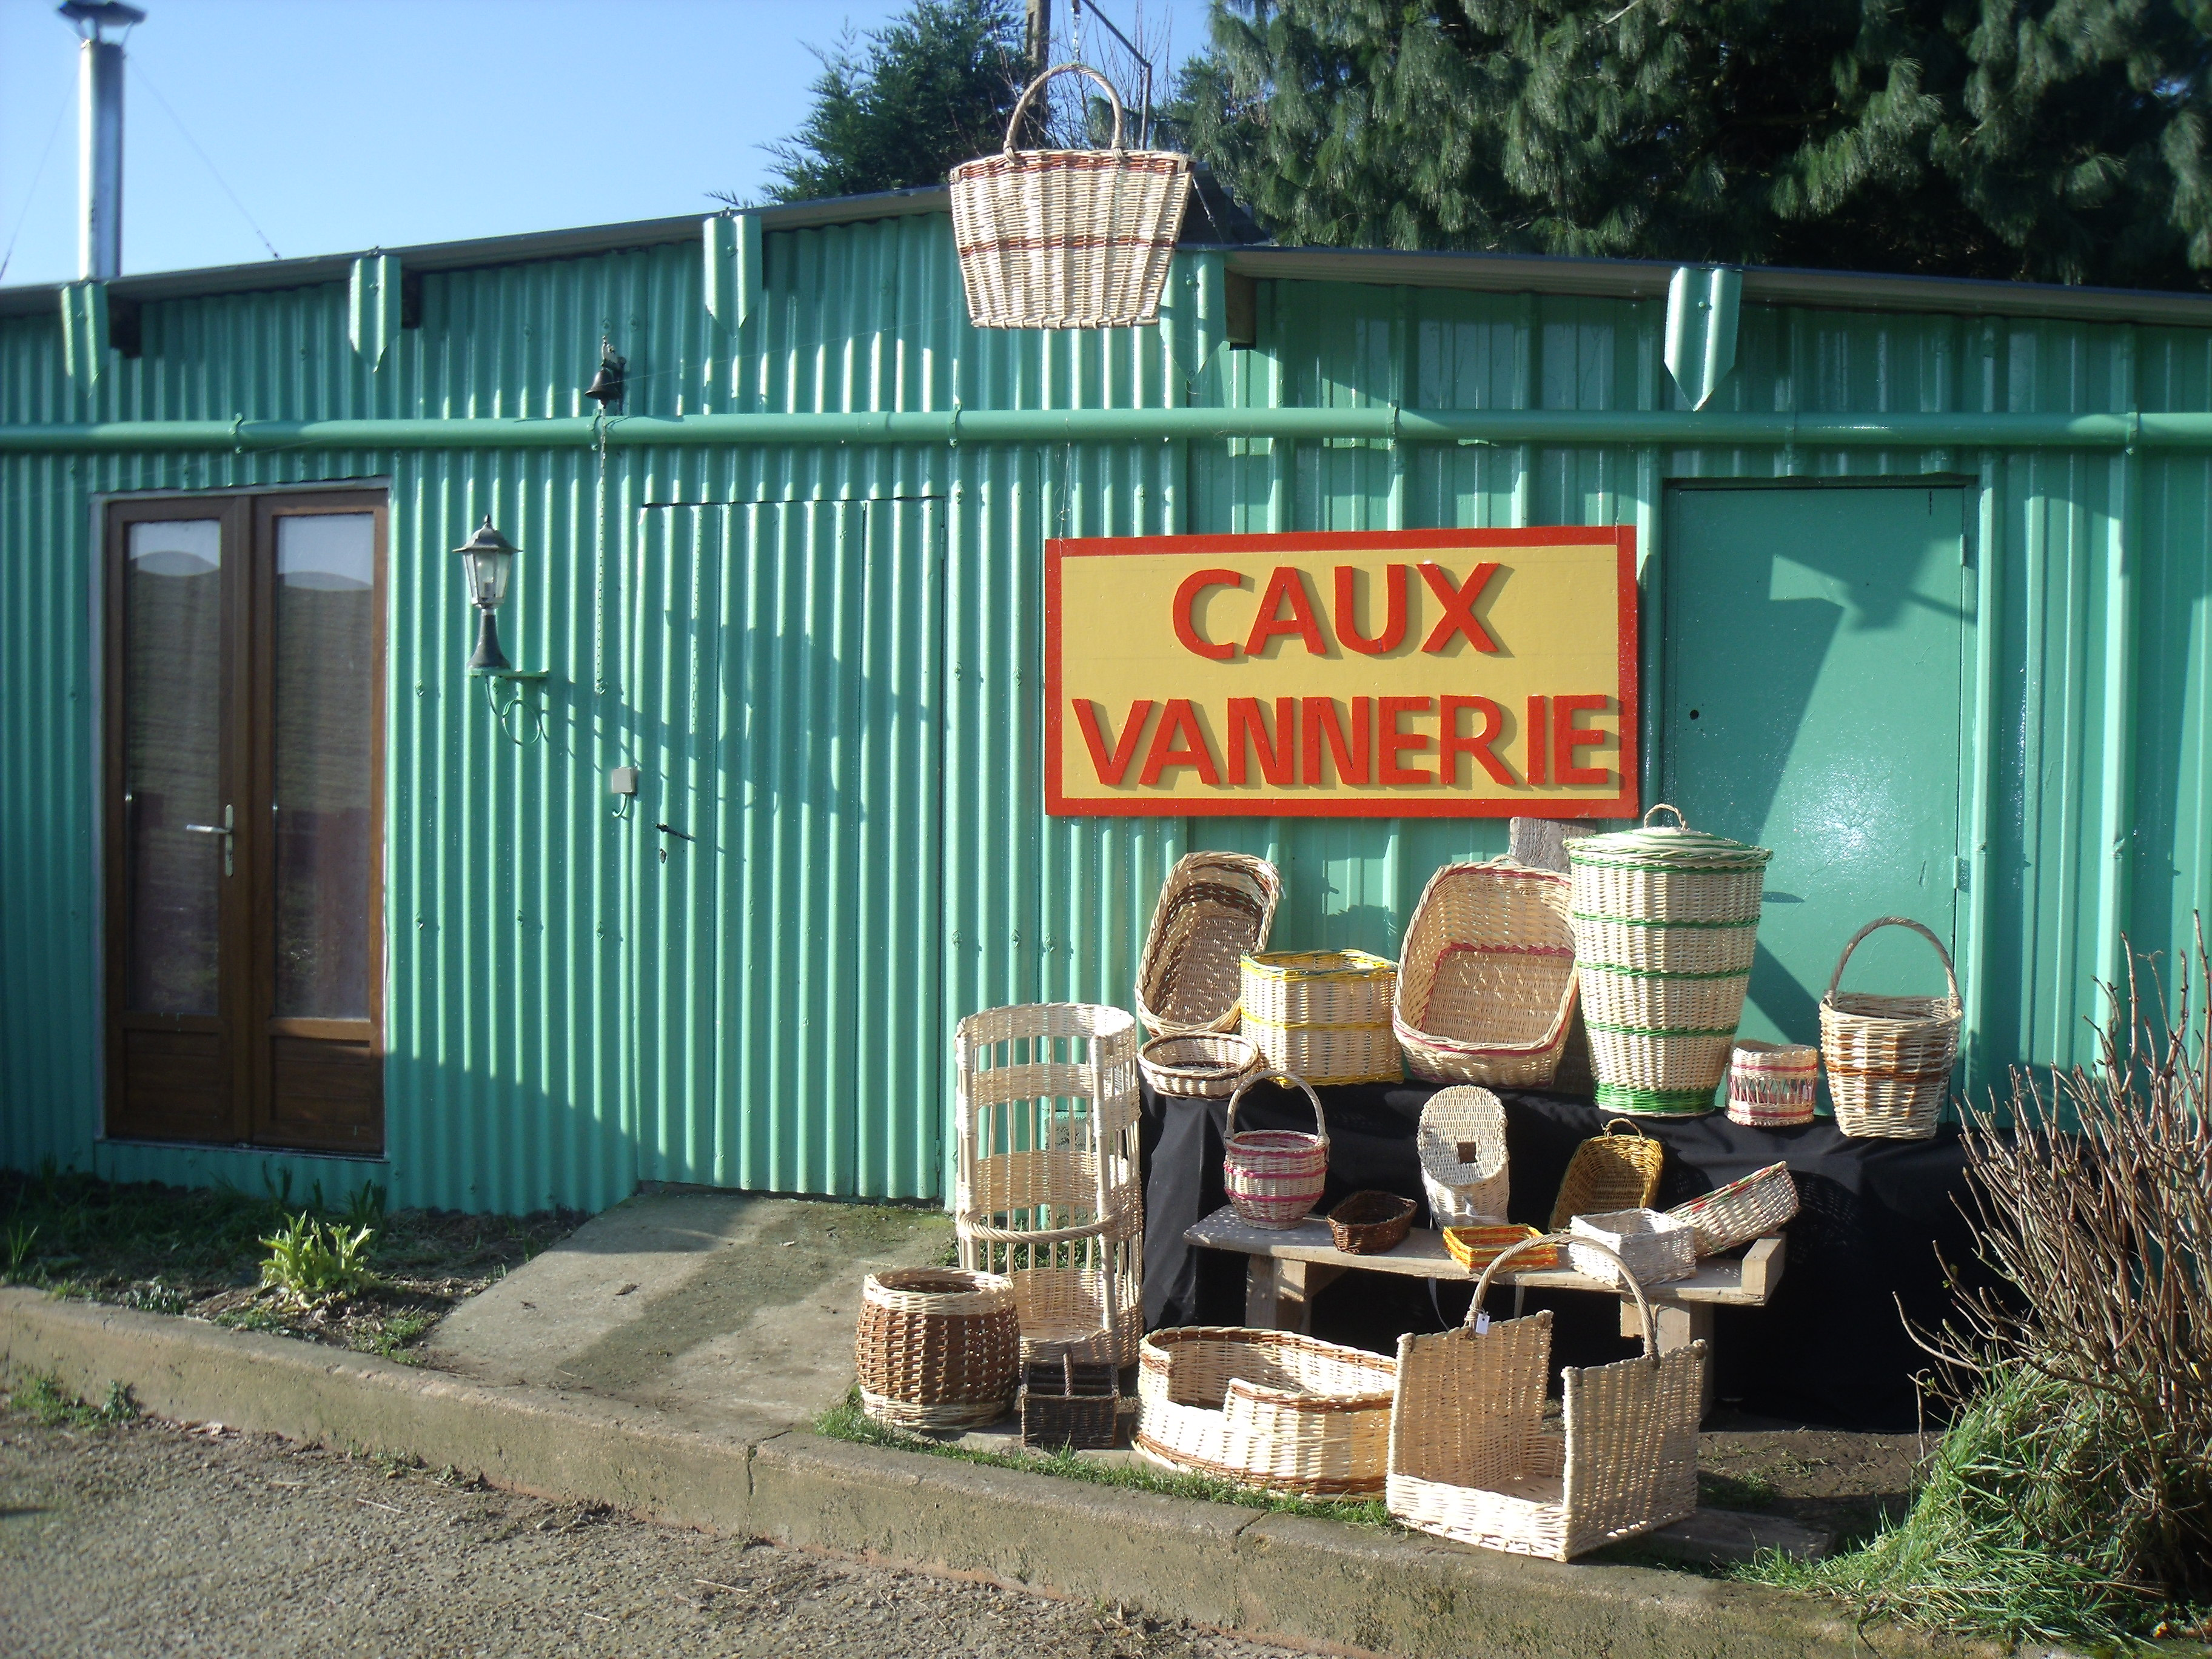 2154-caux-vannerie-76.jpg